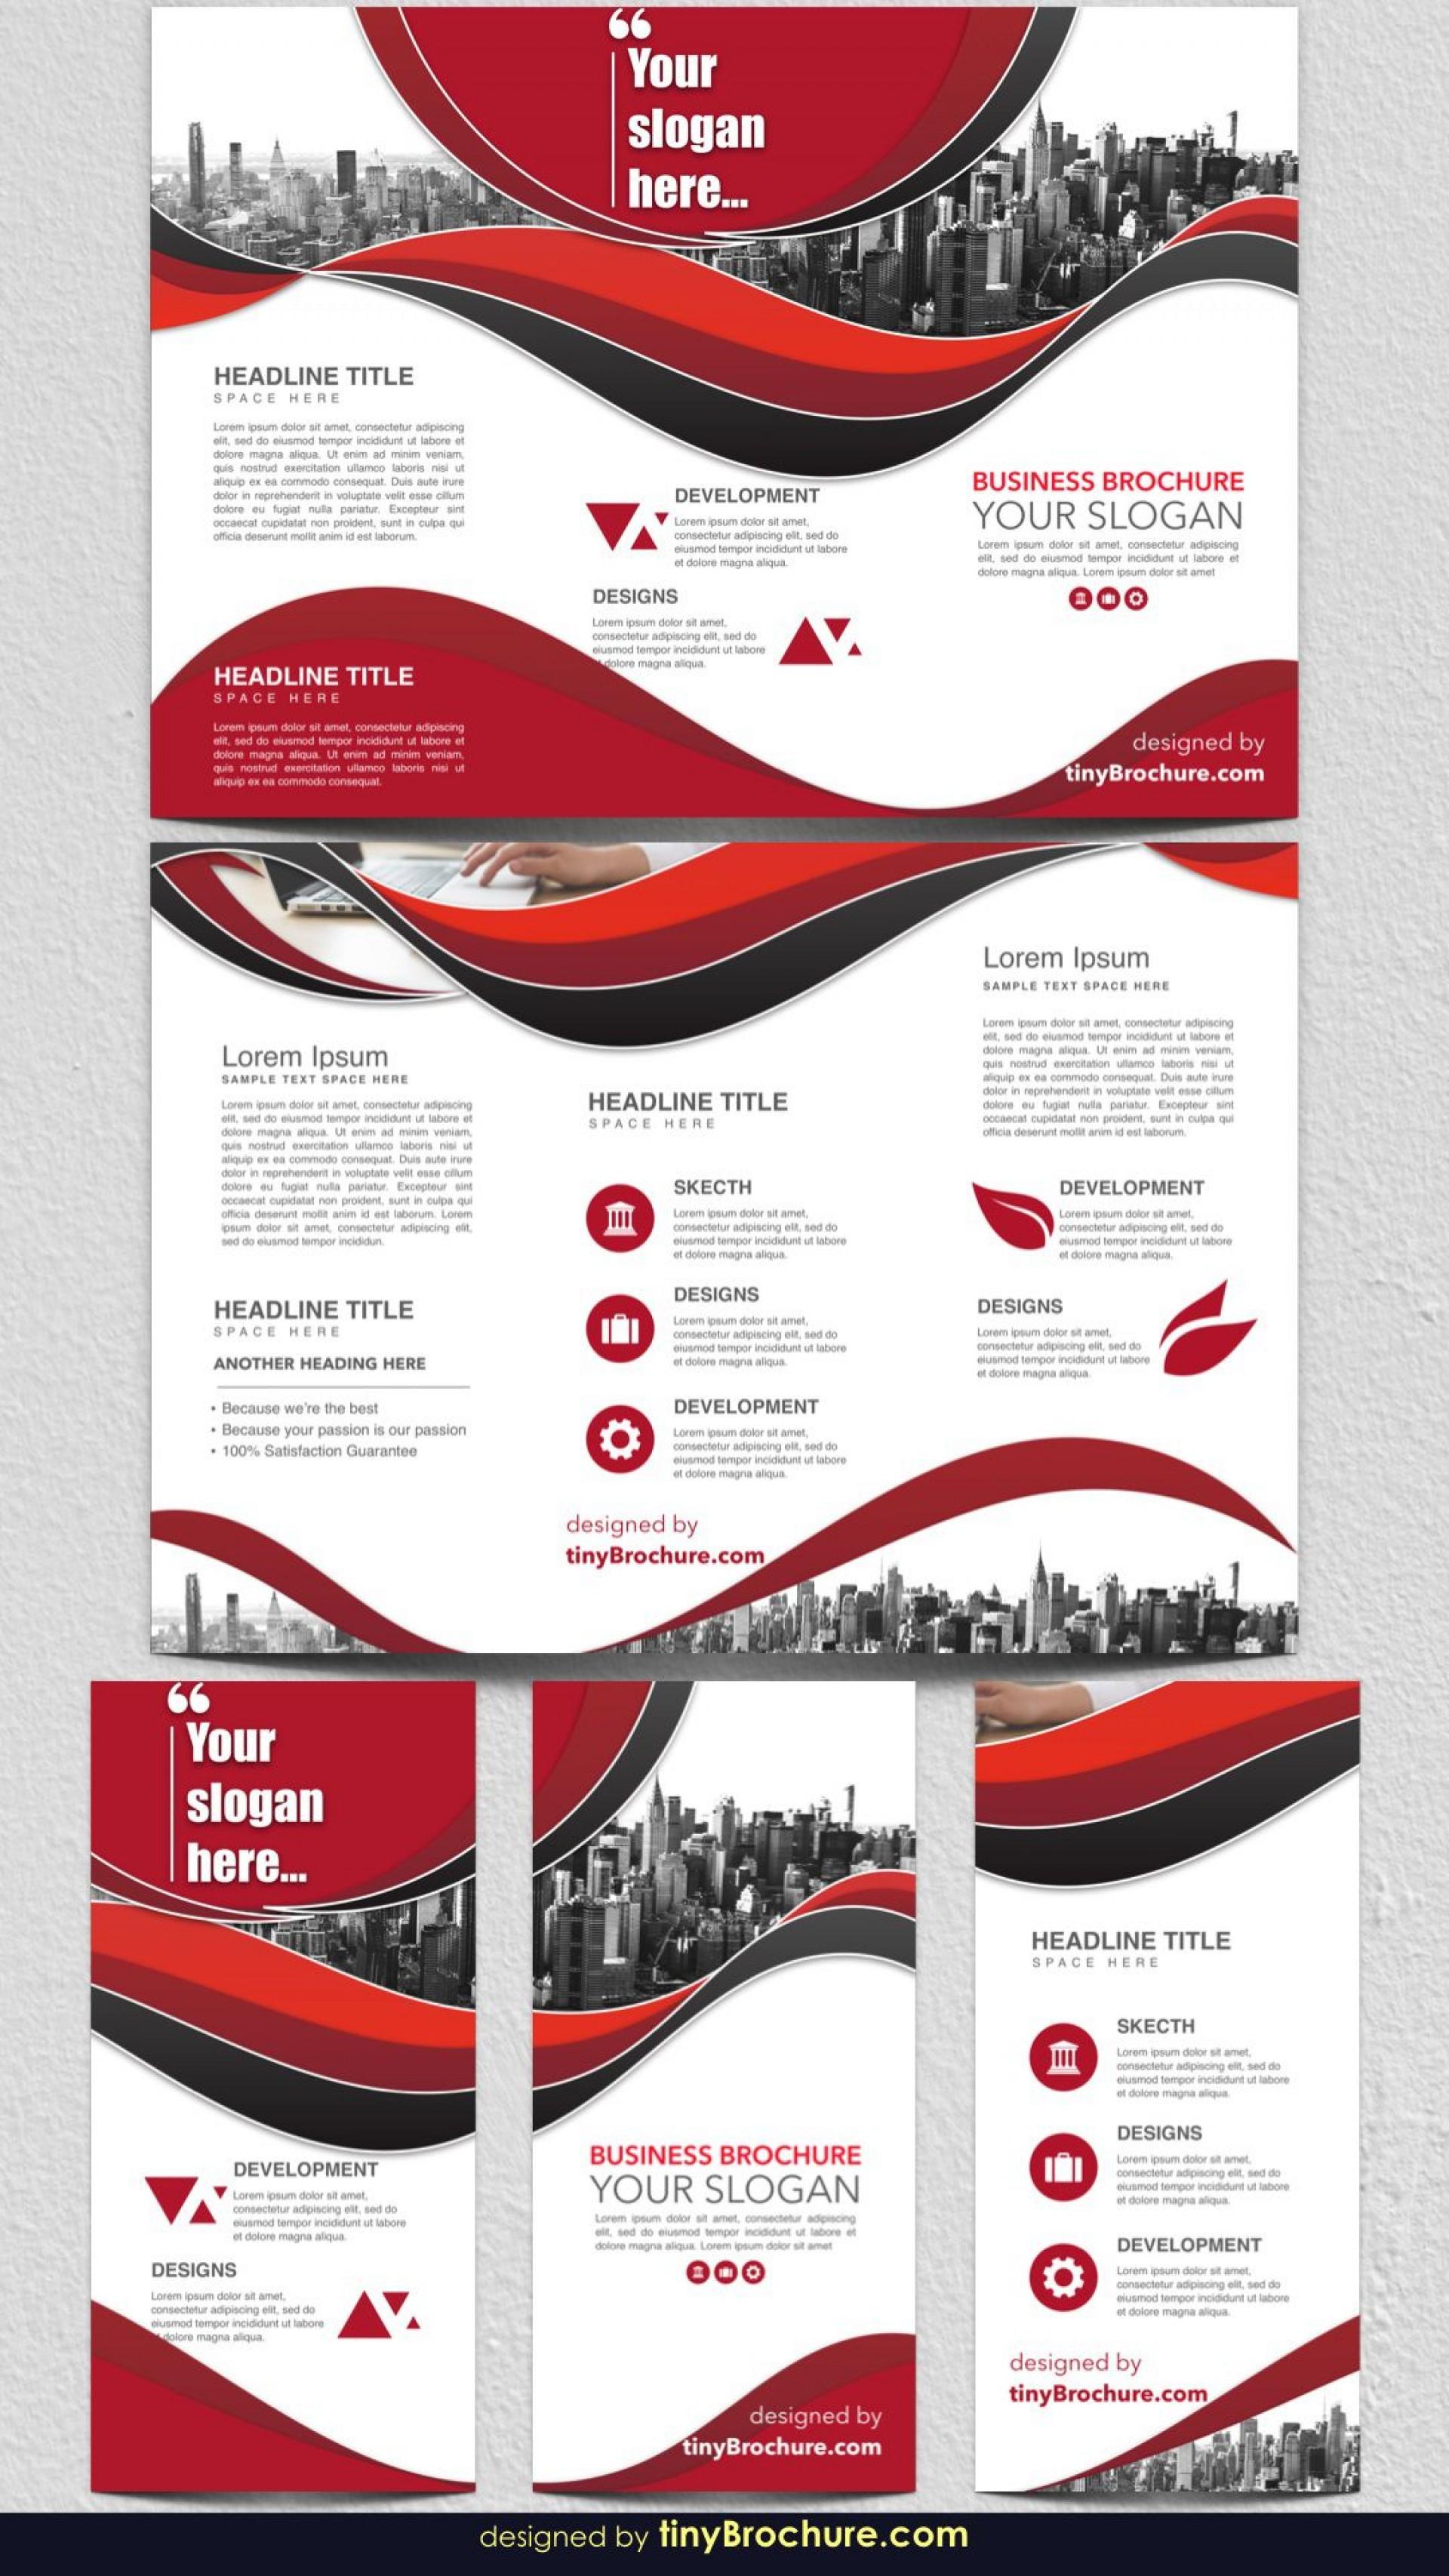 001 Stupendou Tri Fold Template Google Doc Image  Docs Brochure Free Pamphlet Blank Slide1920